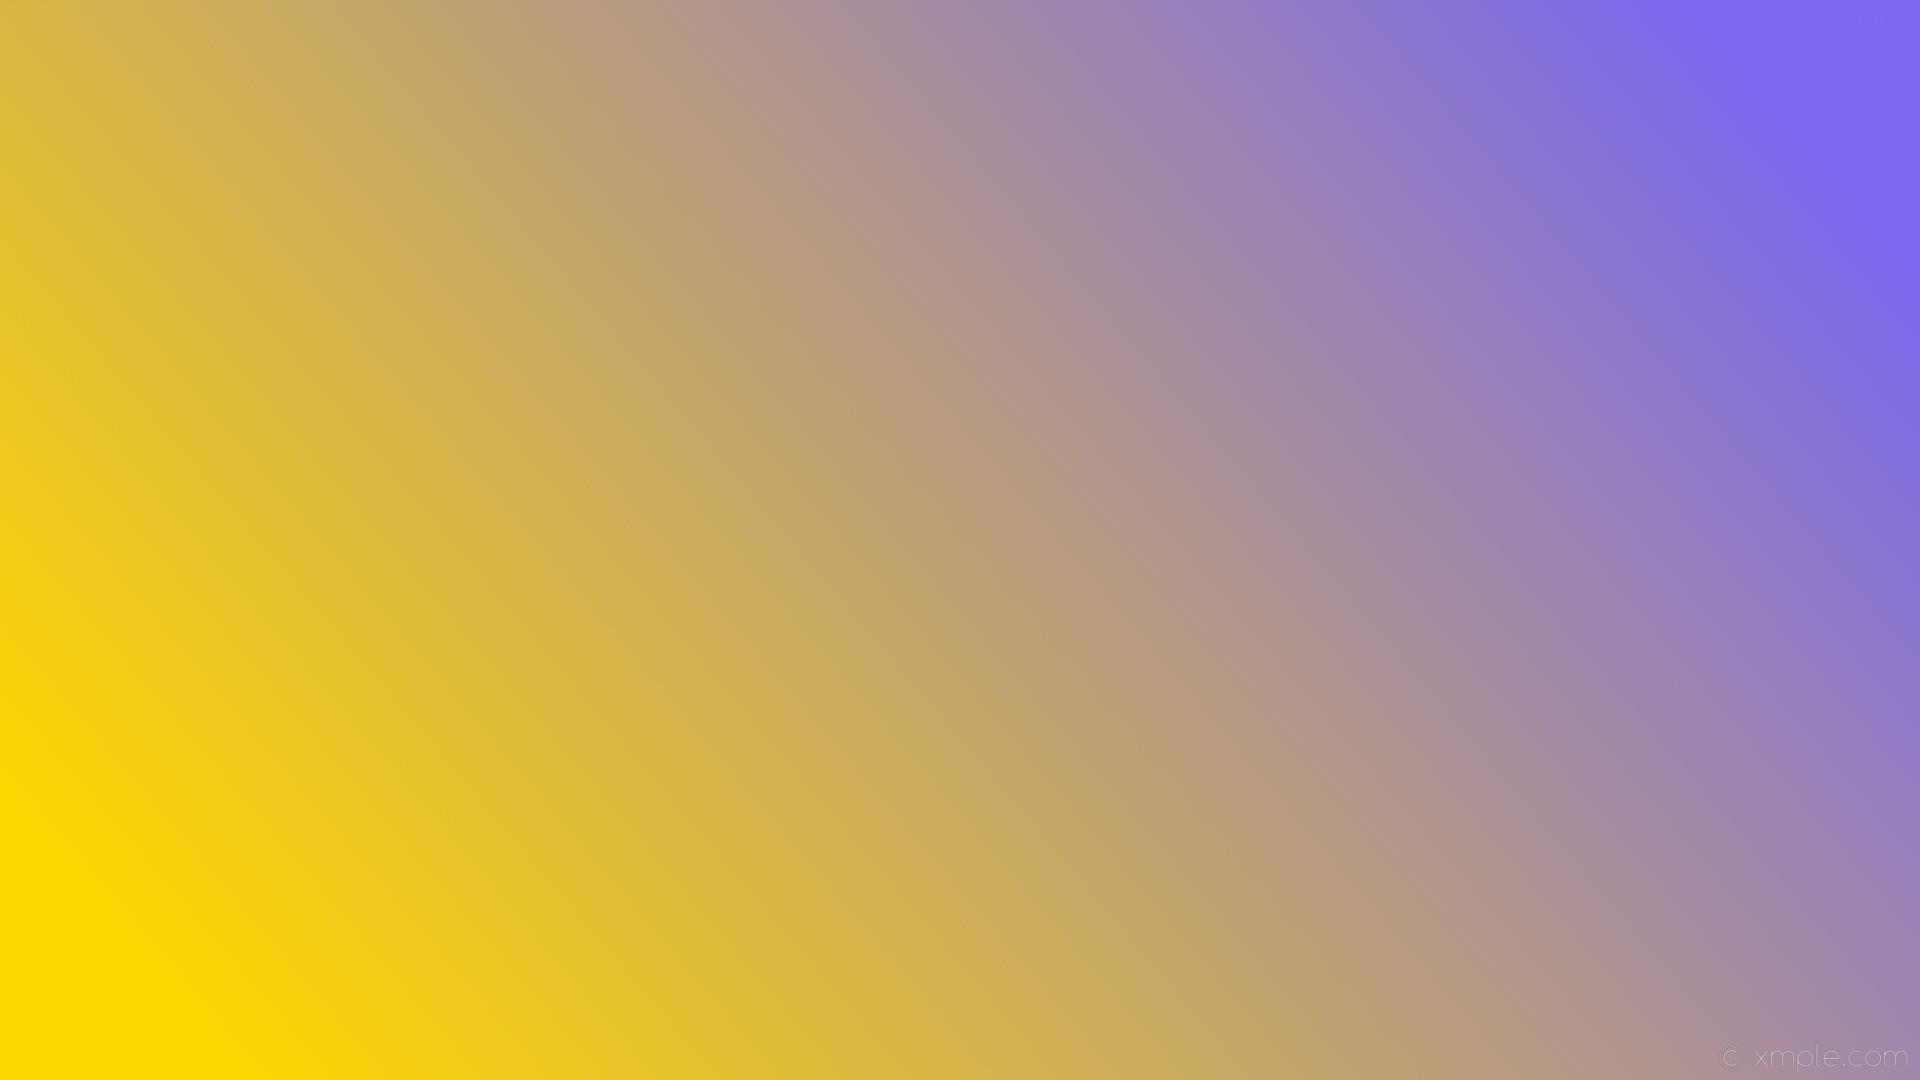 wallpaper yellow gradient linear purple gold medium slate blue #ffd700  #7b68ee 195°